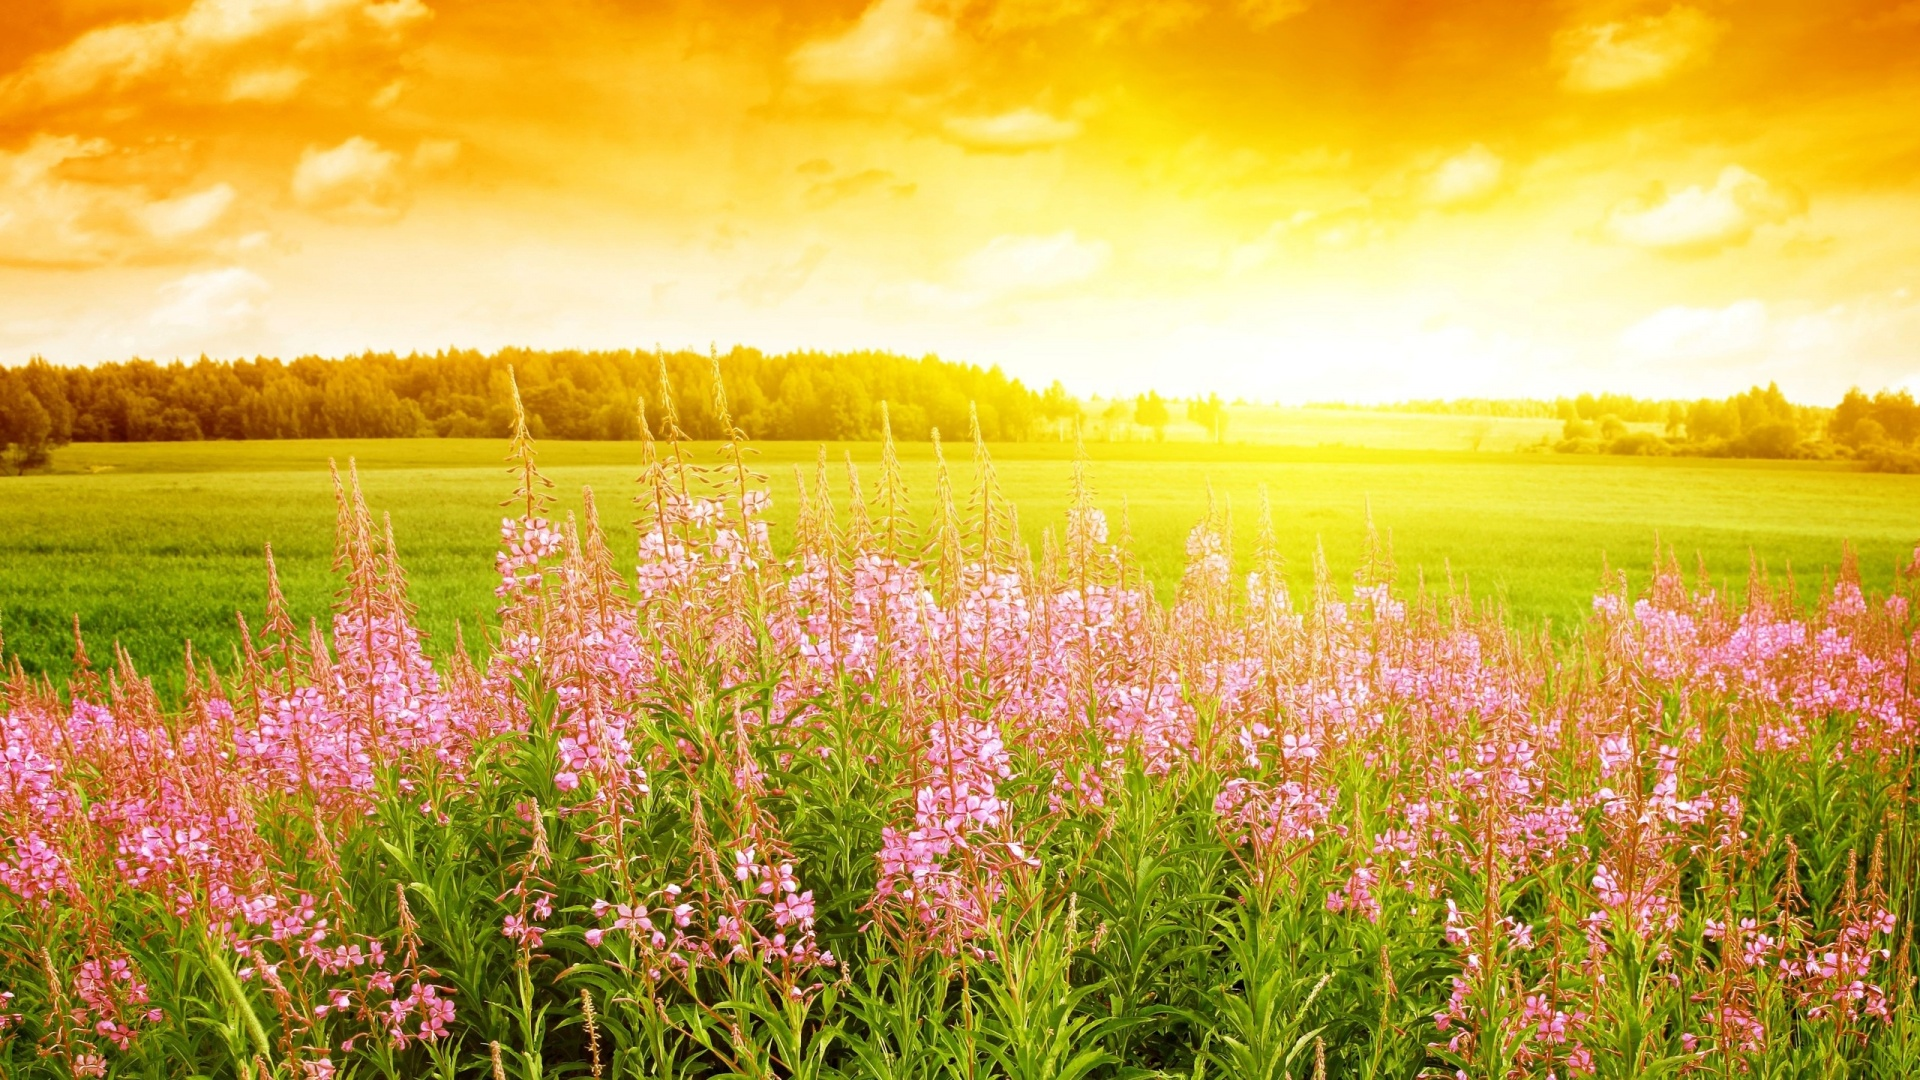 Summer Field Flowers 1920 x 1080 Download Close 1920x1080